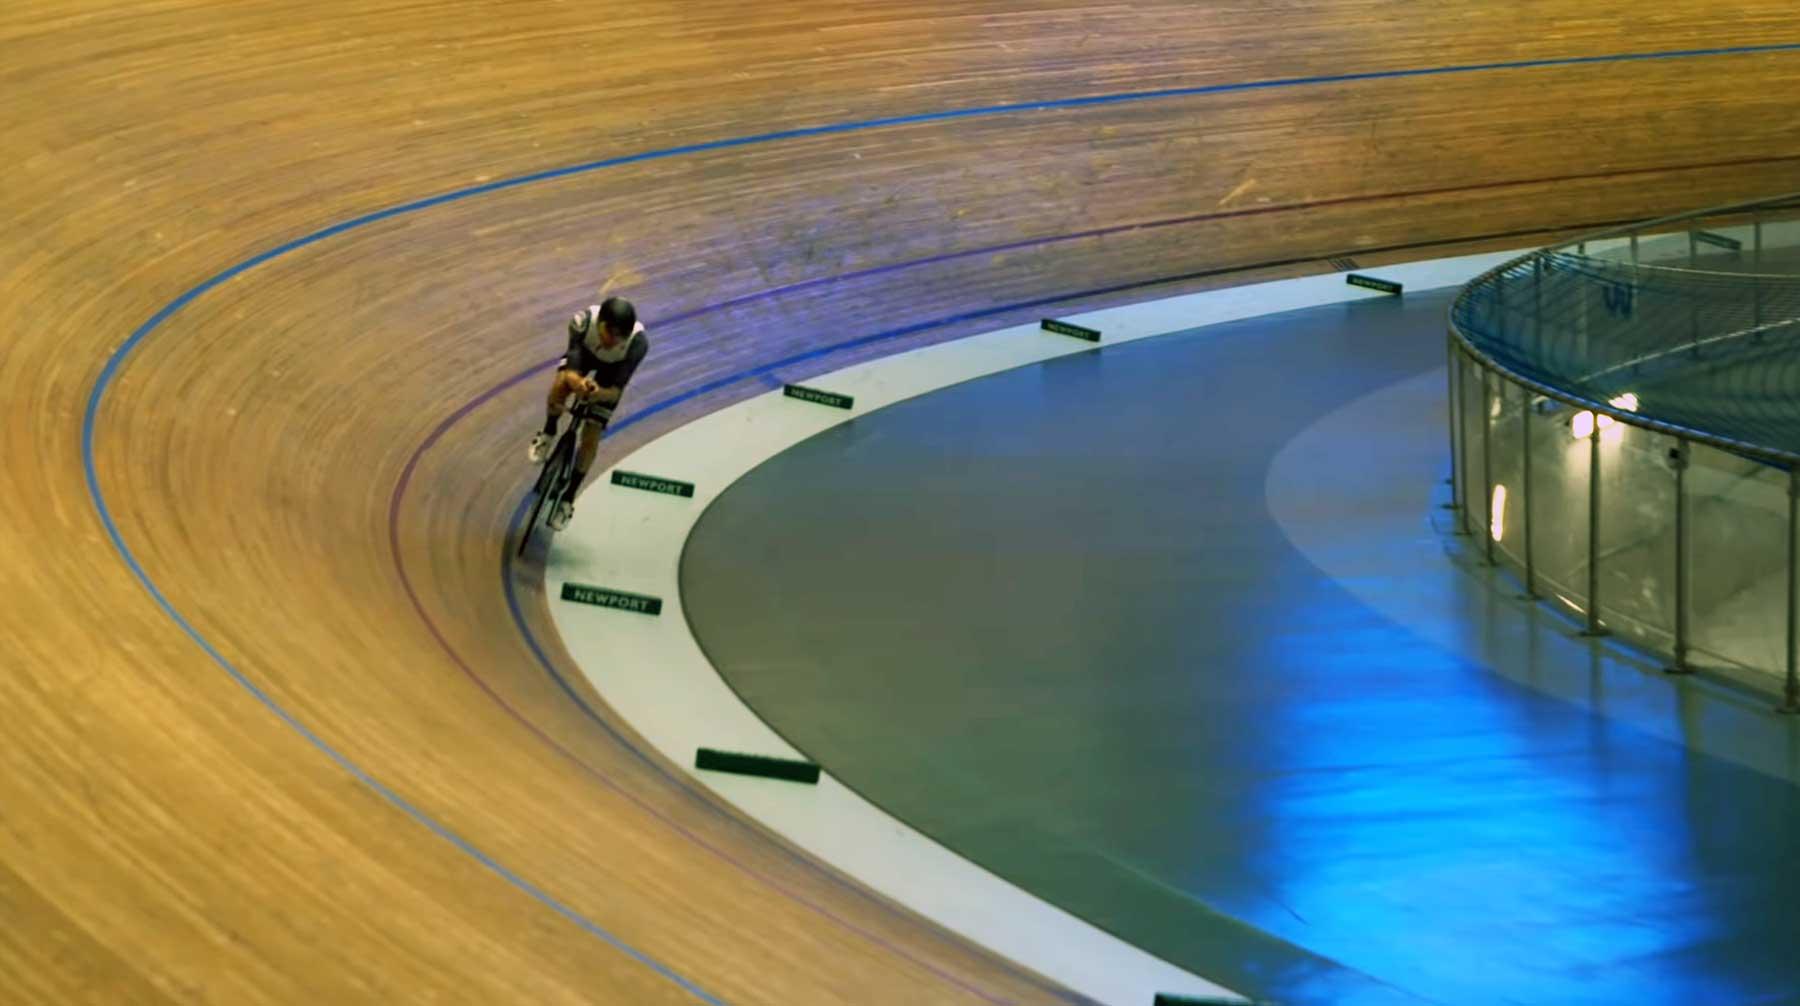 950 Kilometer Fahrrad fahren in 24 Stunden